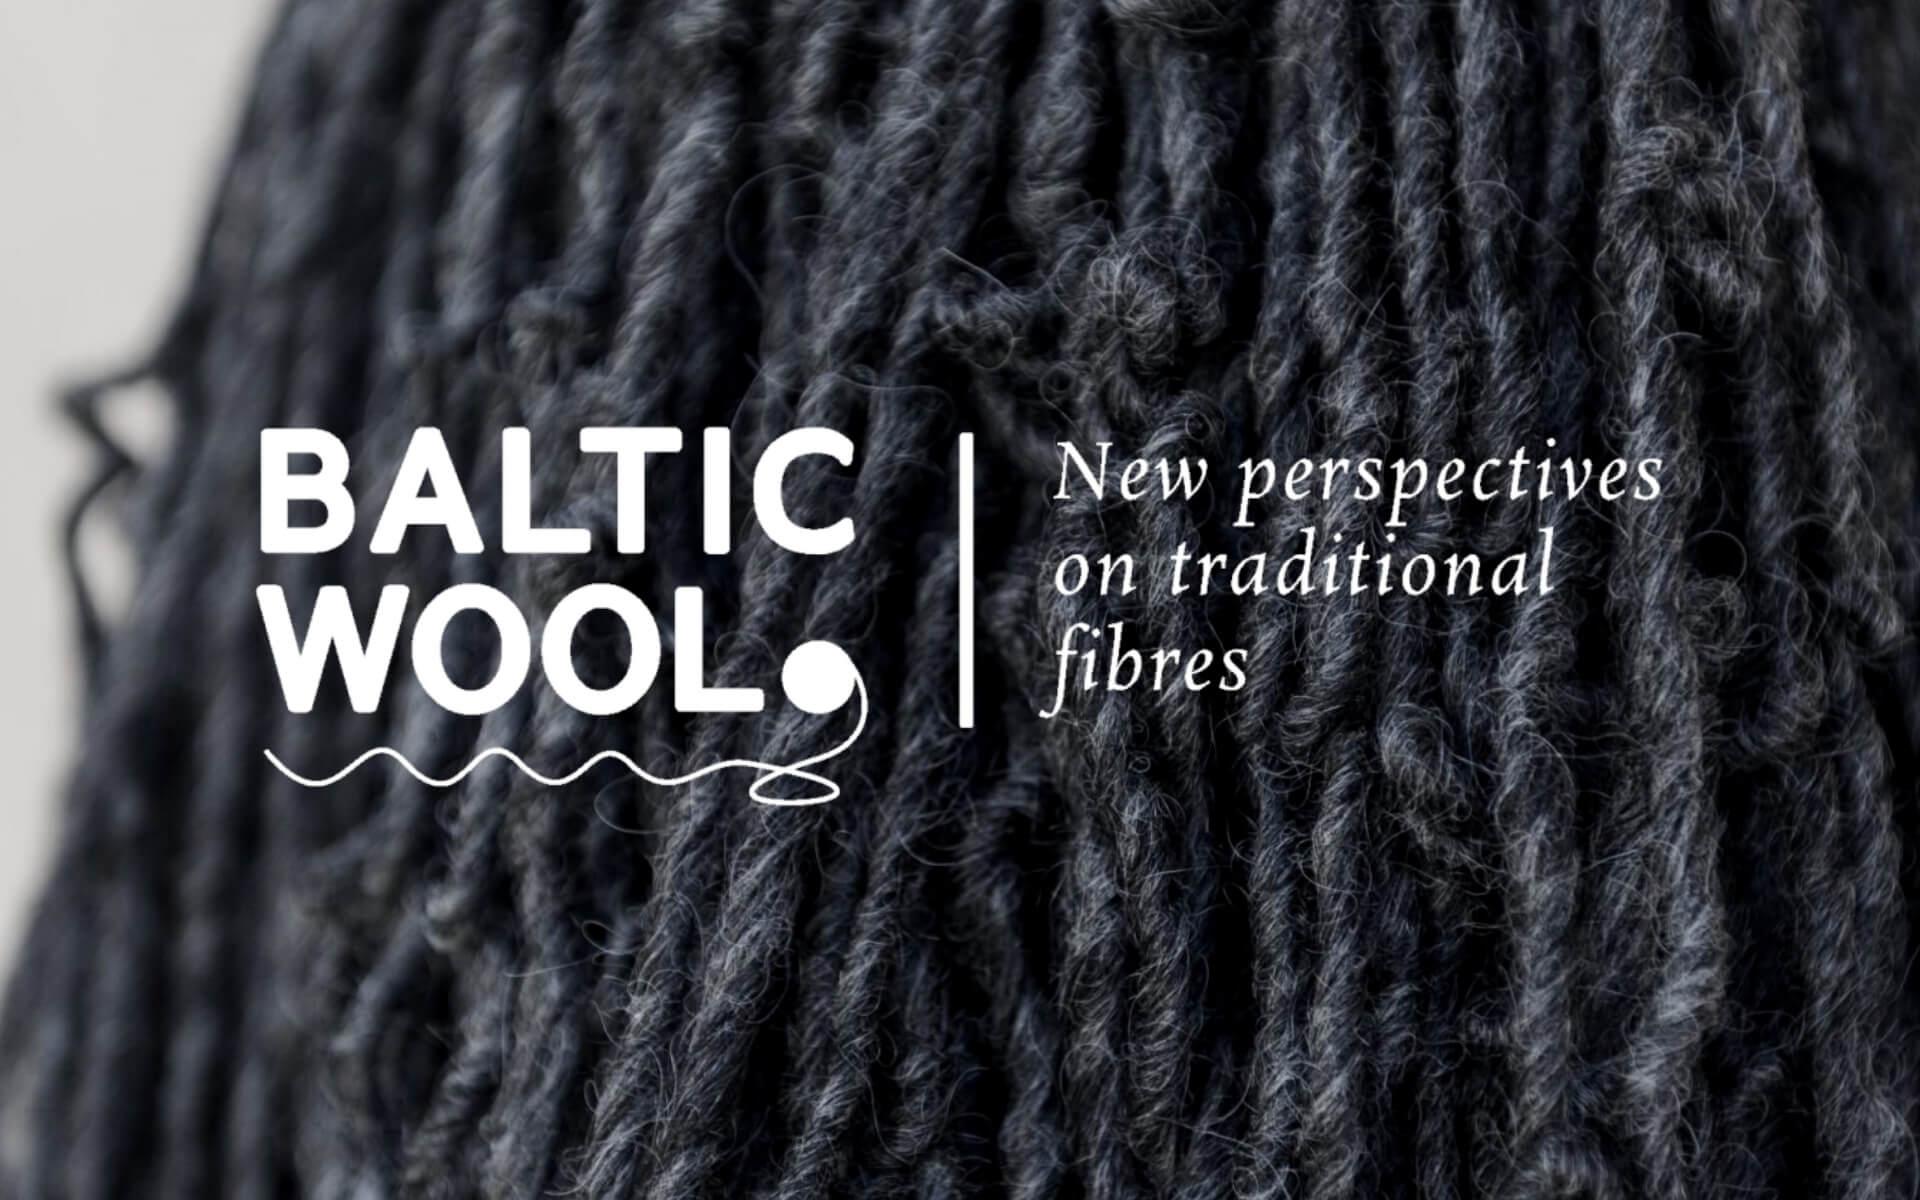 Baltic Wool Conference Katrin Kabun